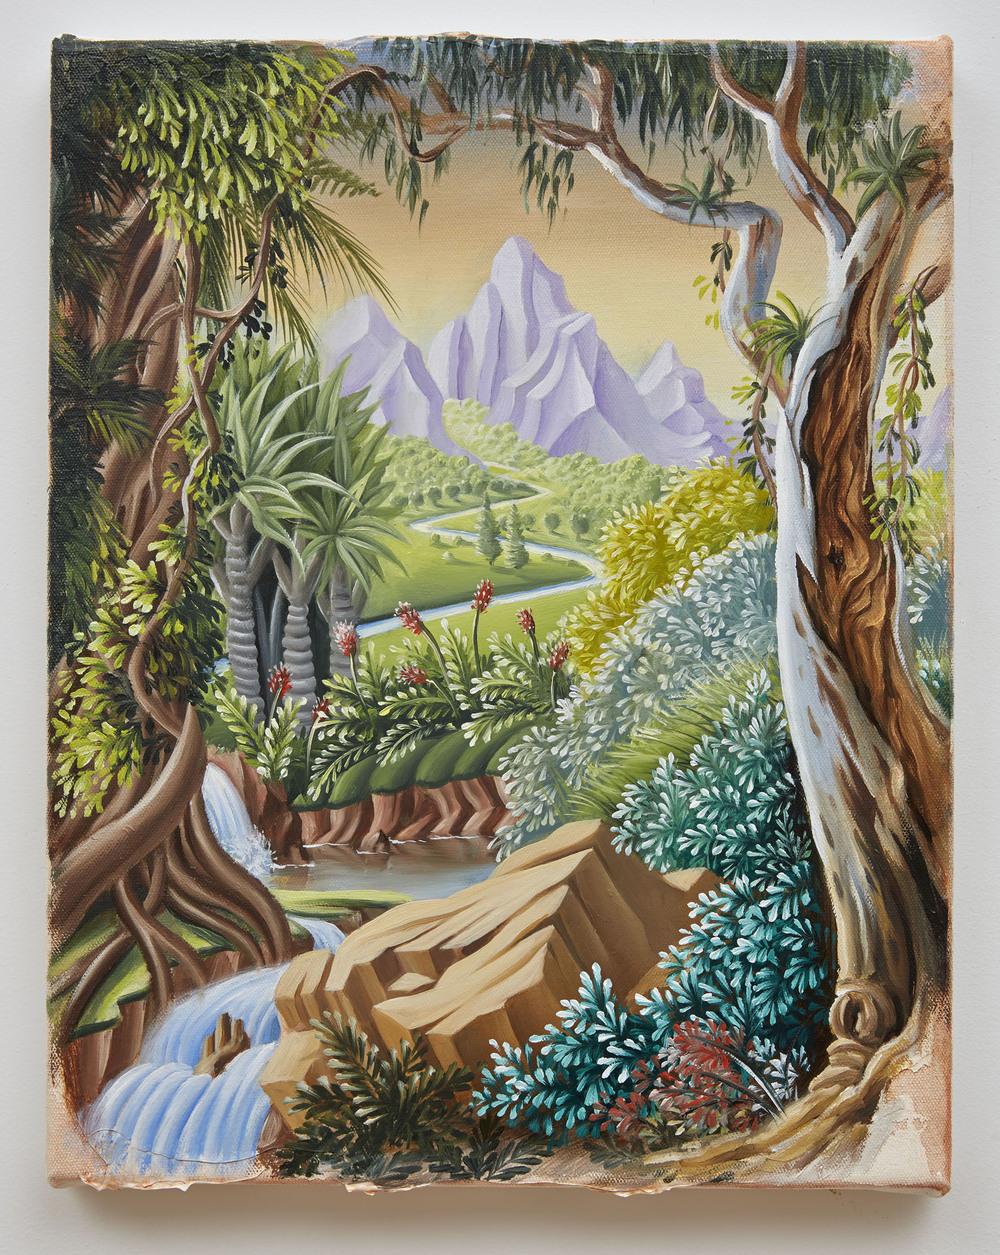 PETER DAVERINGTON   The Meadow of Melancholia  2014 oil on canvas 41 x 32 cm